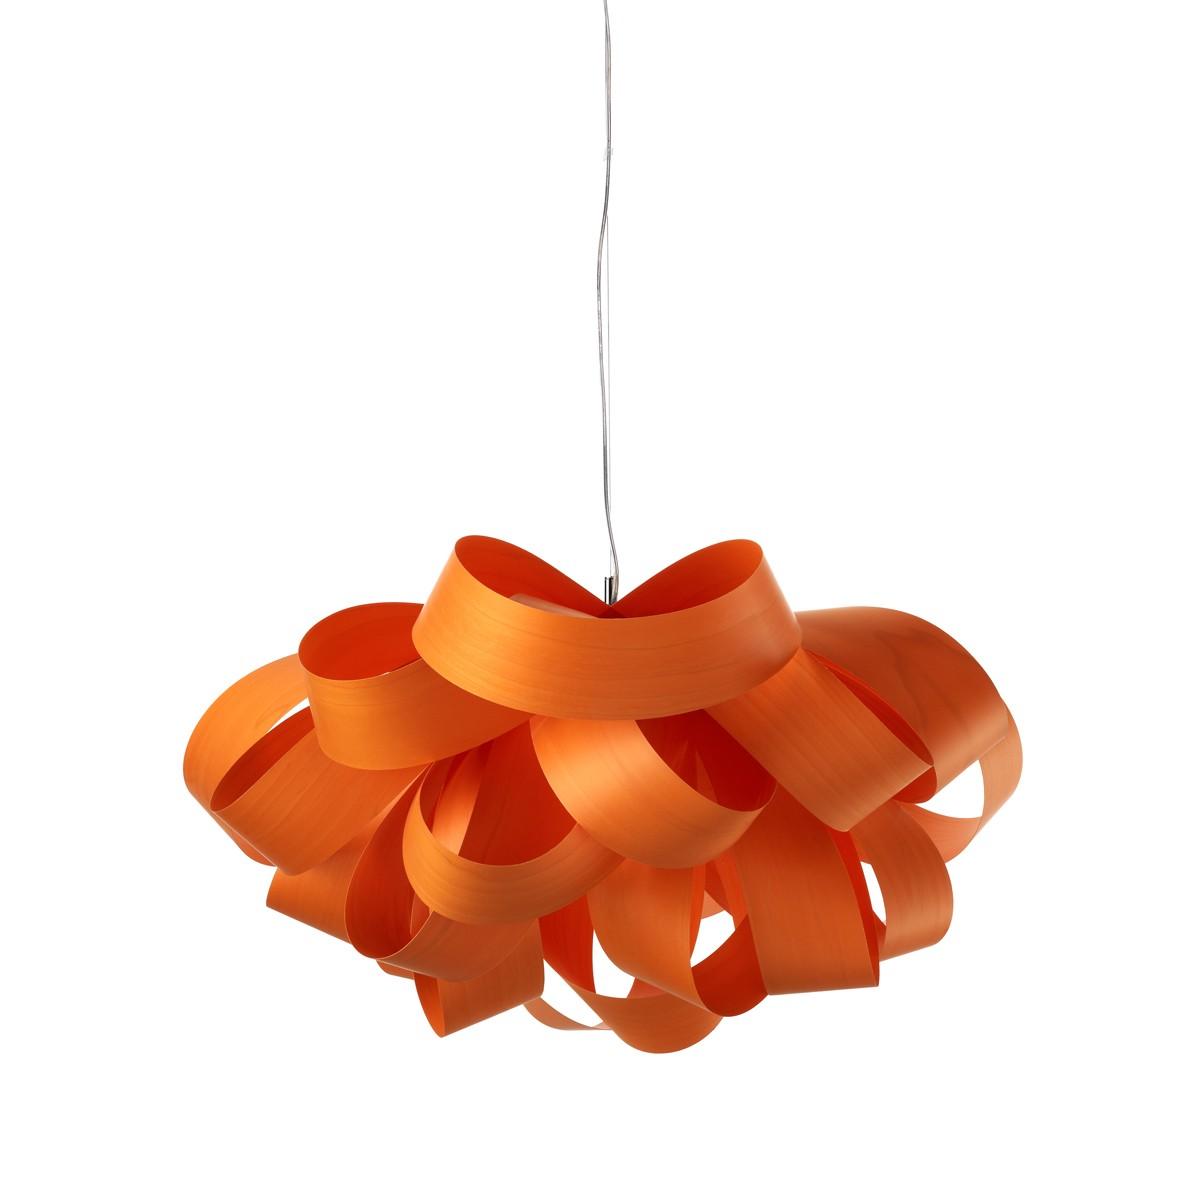 LZF Lamps Agatha Small Pendelleuchte, orange